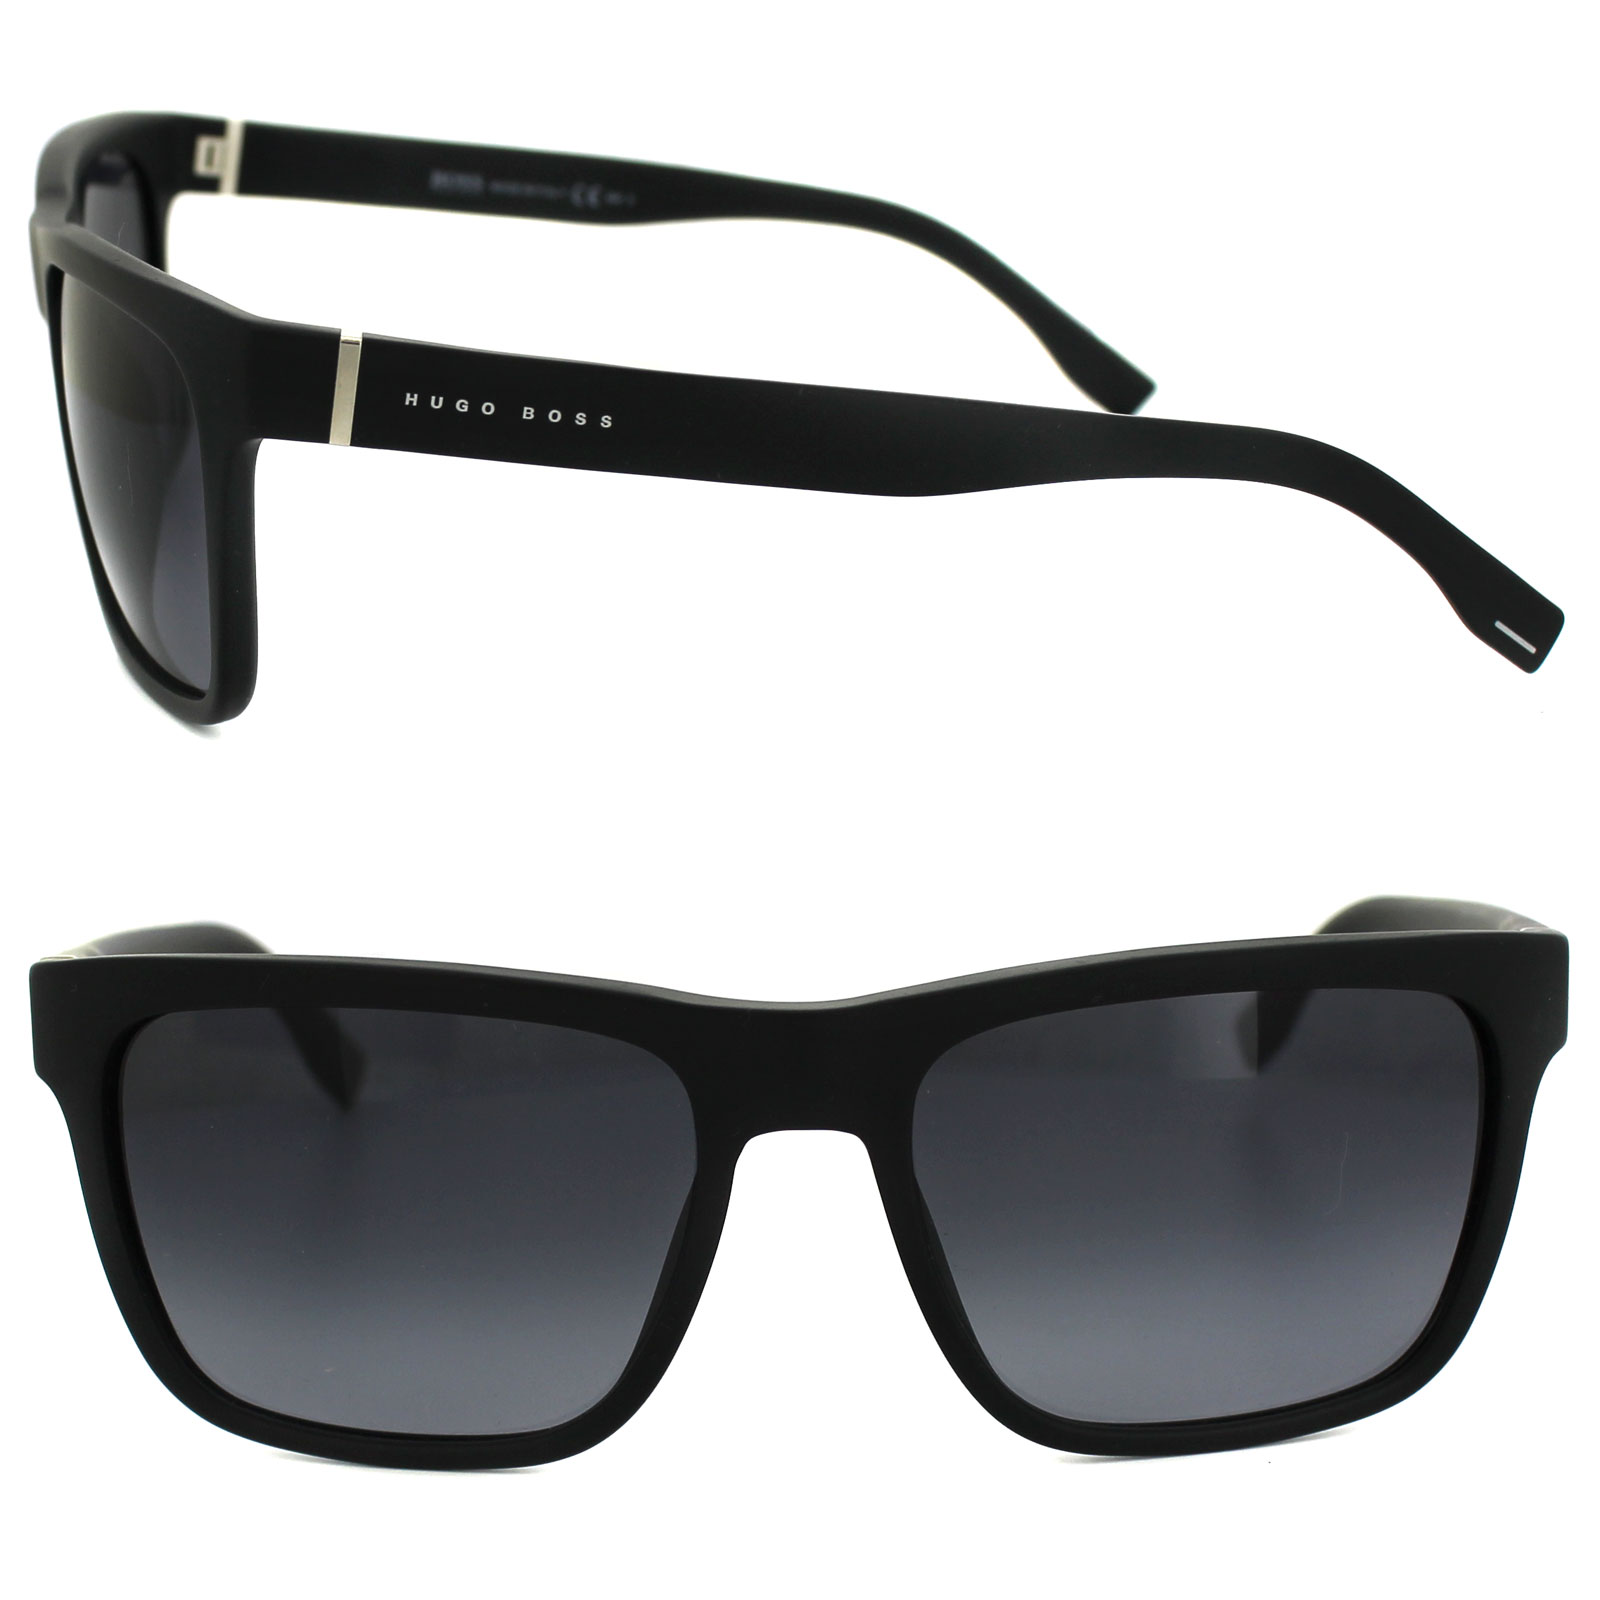 ded747d7bc9b4 Sentinel Hugo Boss Sunglasses 0727 DL5 HD Matt Black Grey Gradient